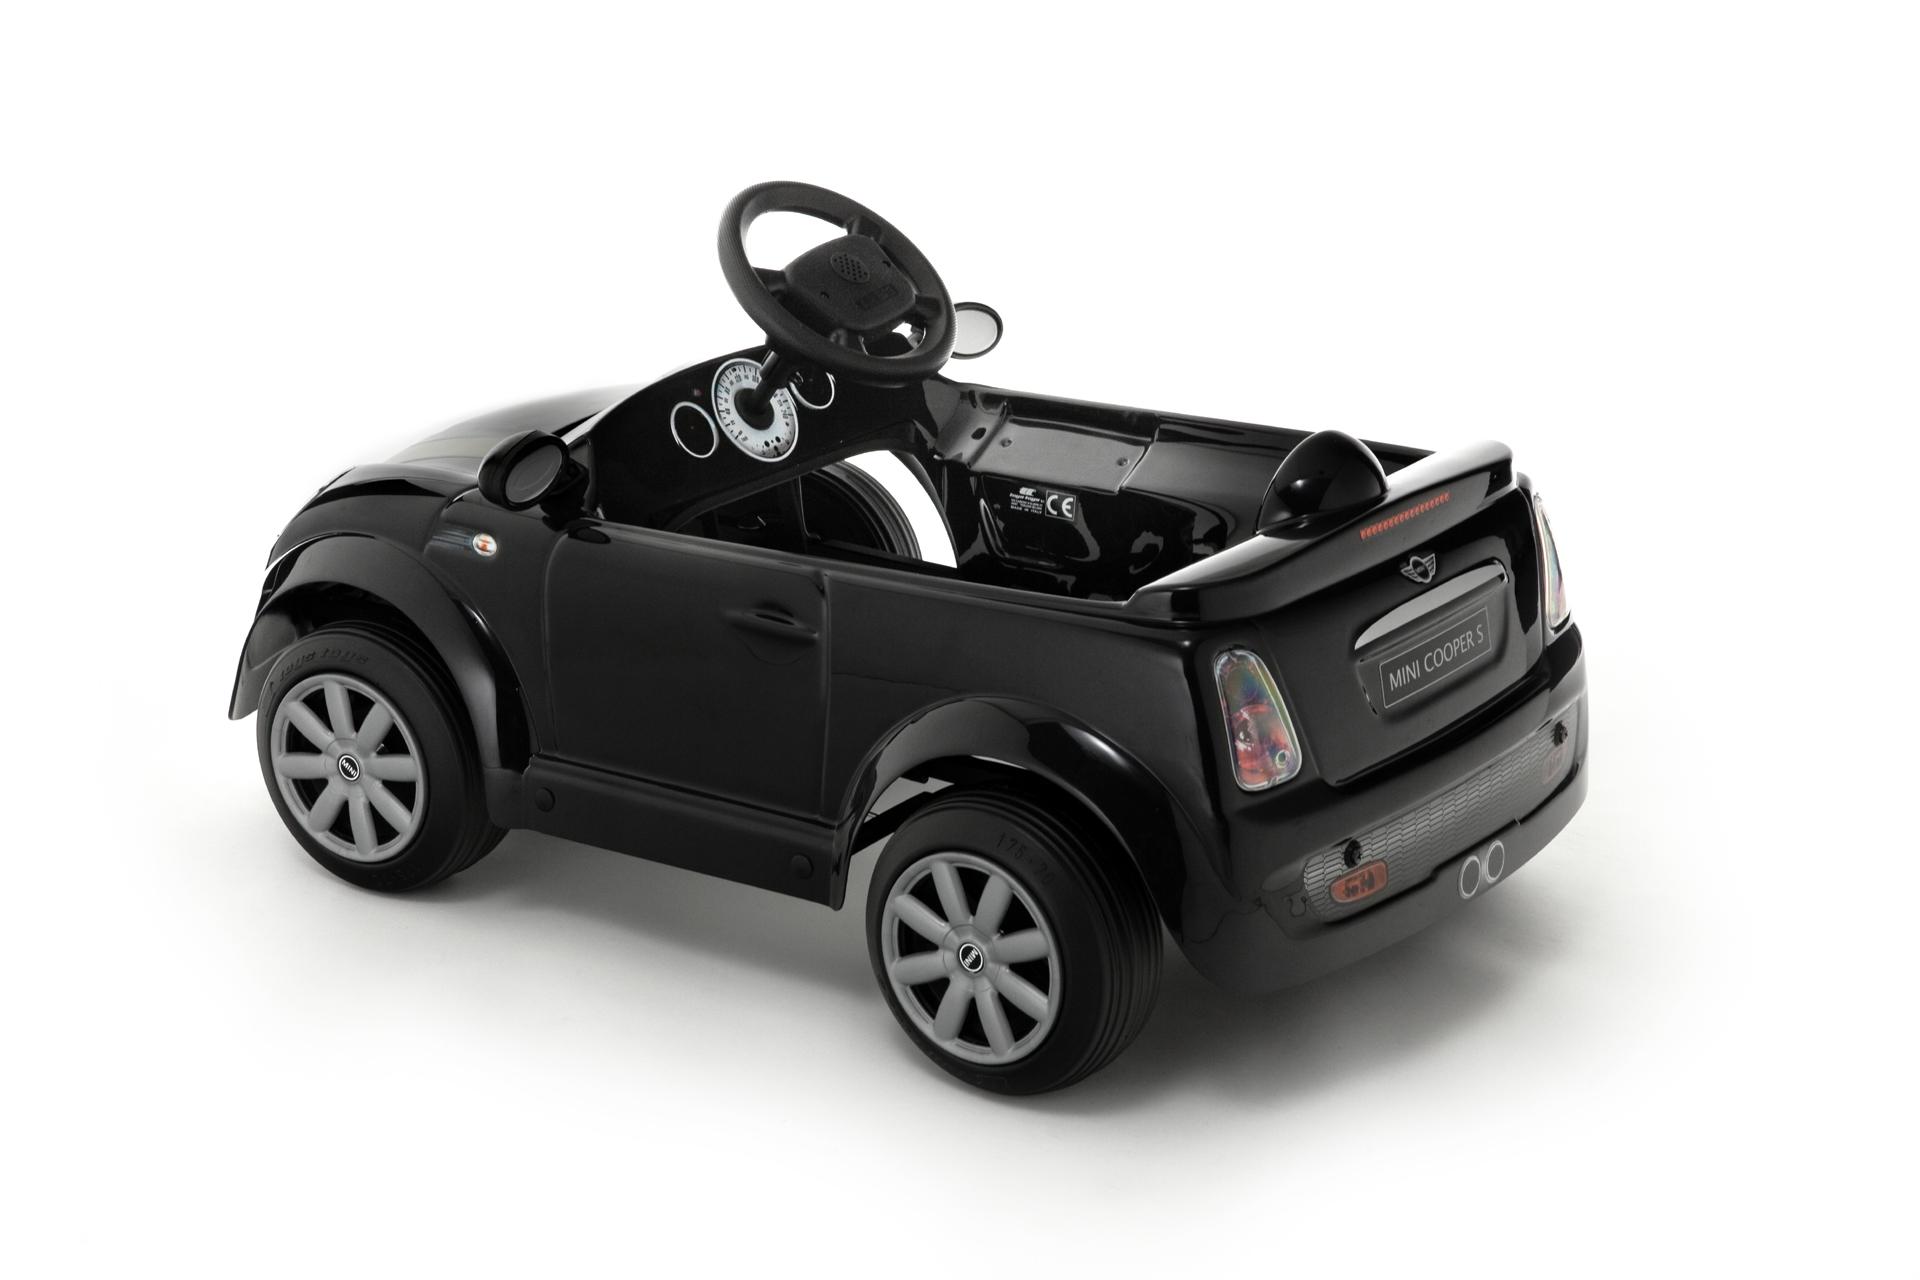 Kinder Elektroauto Toys Toys MINI Cooper S Black Edition